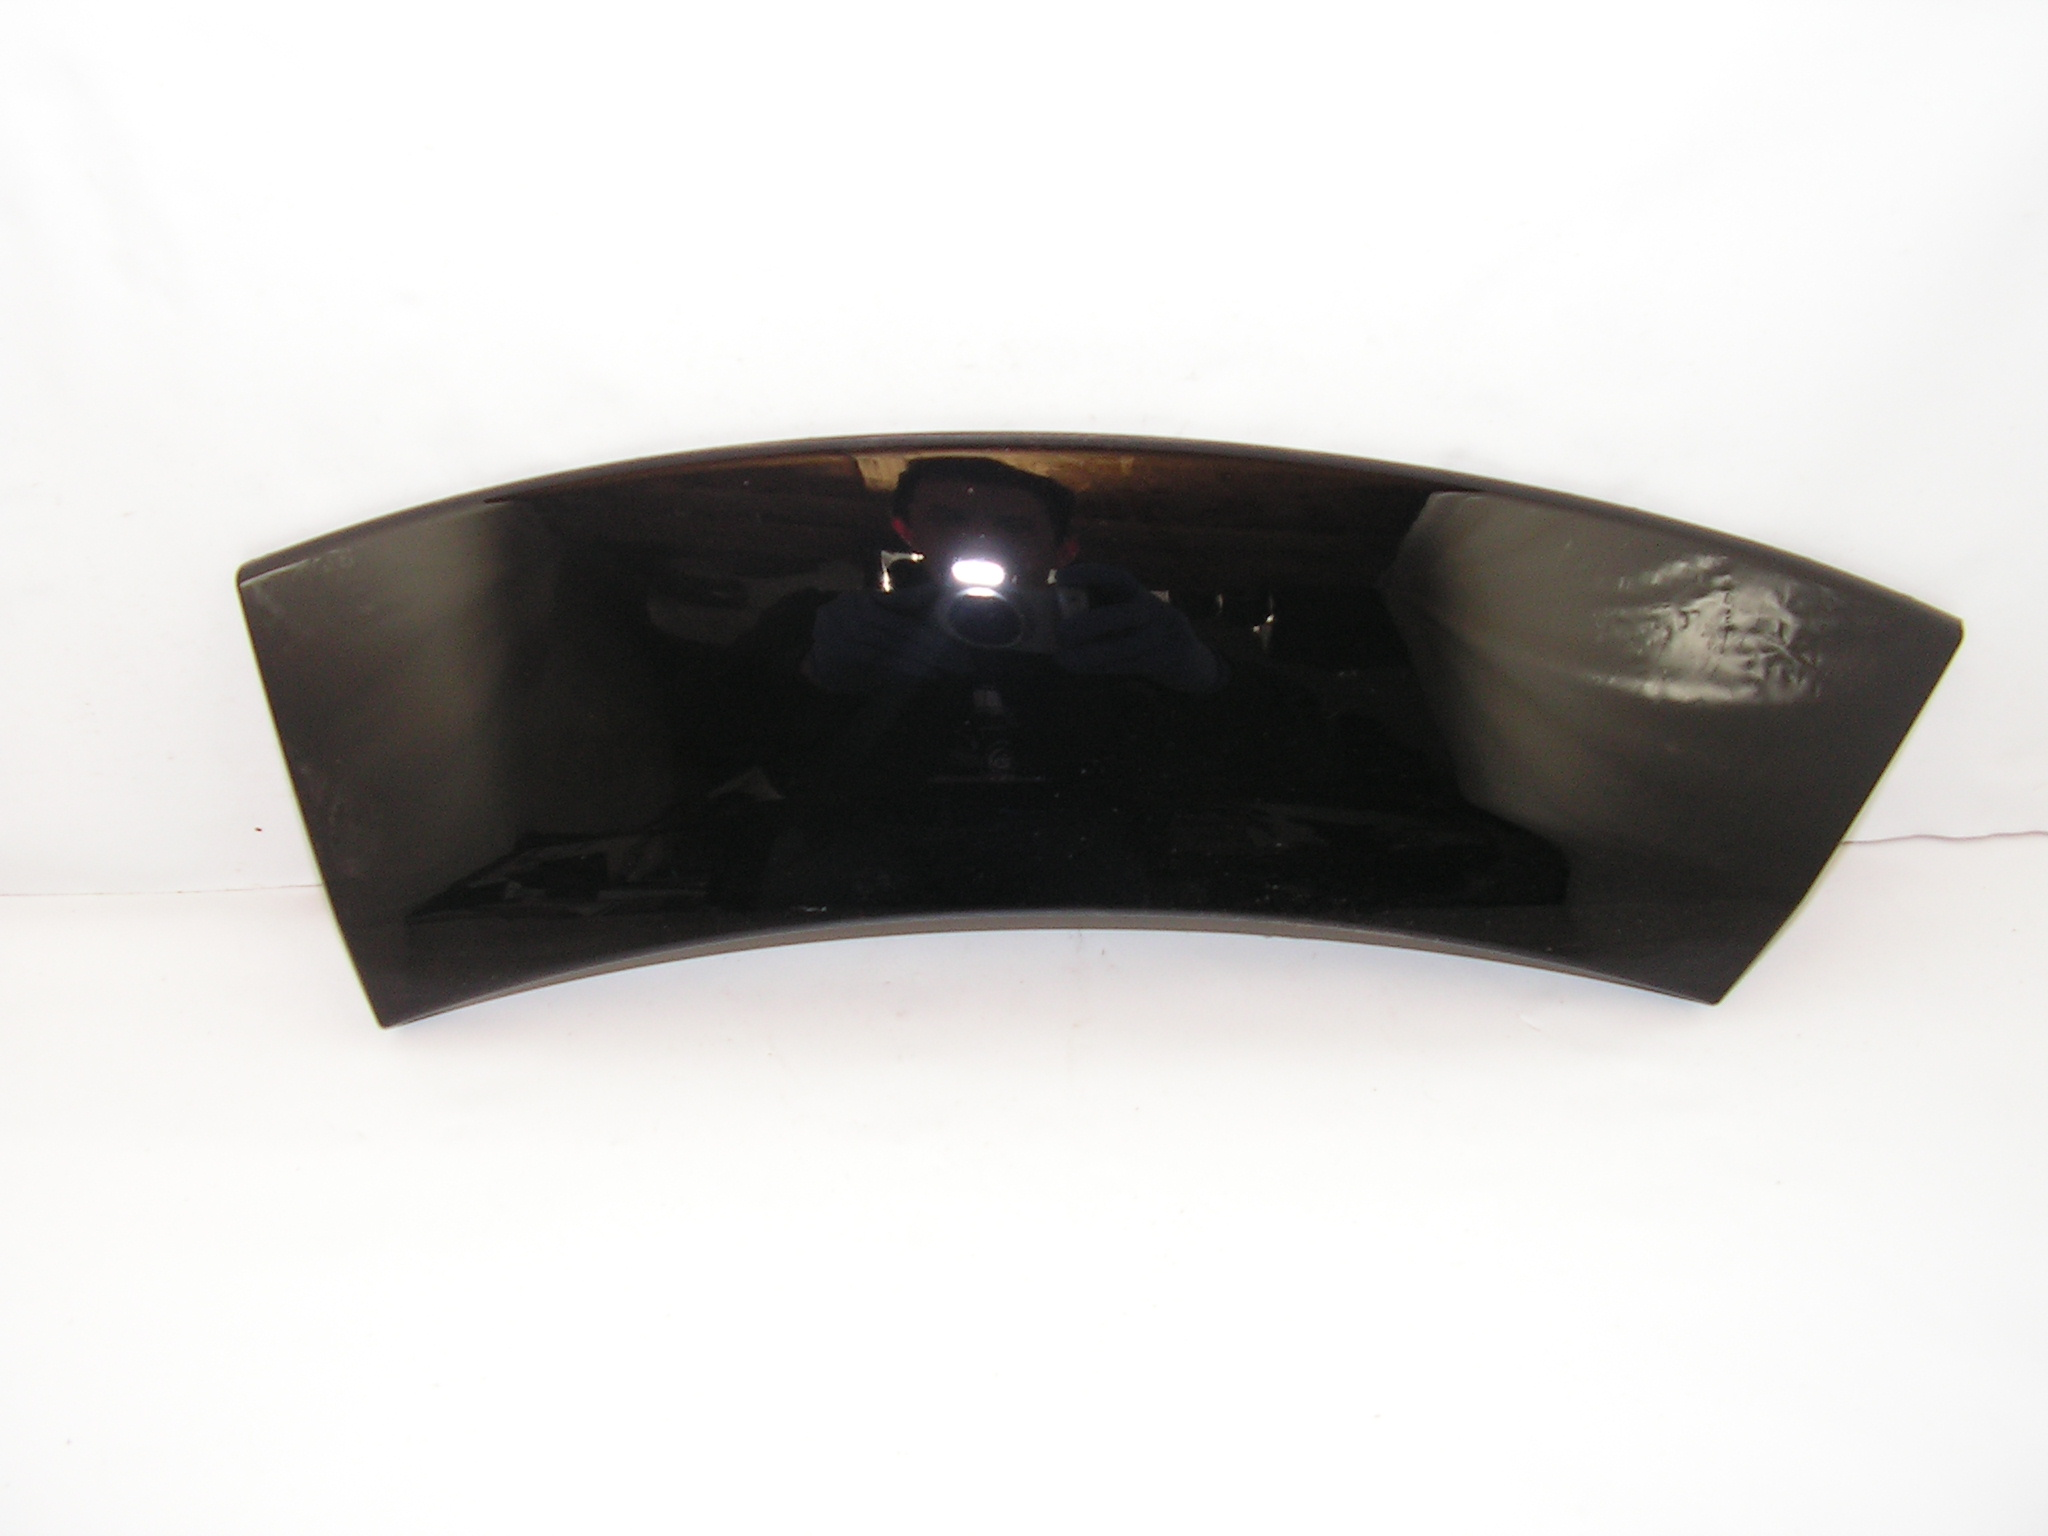 Picture of KIA SOUL II FENDER FLARE LEFT REAR B2F46-AB5A0